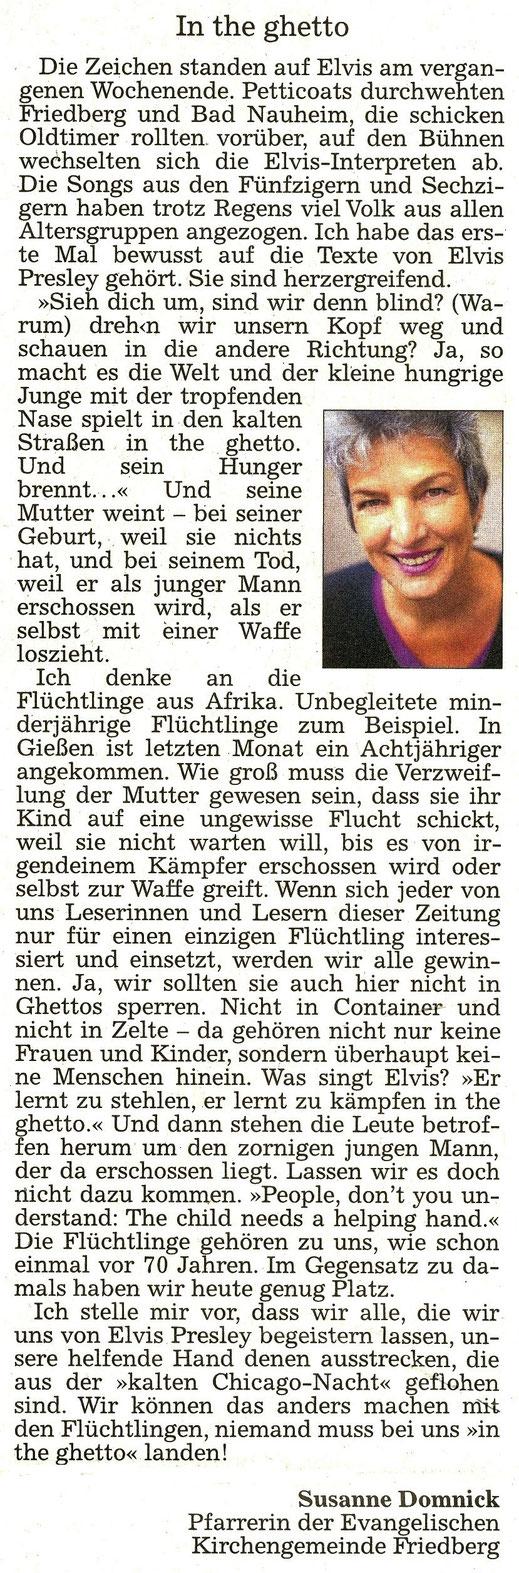 WZ 22.08.2015 - Susanne Domnick, Pfarrerin Friedberg